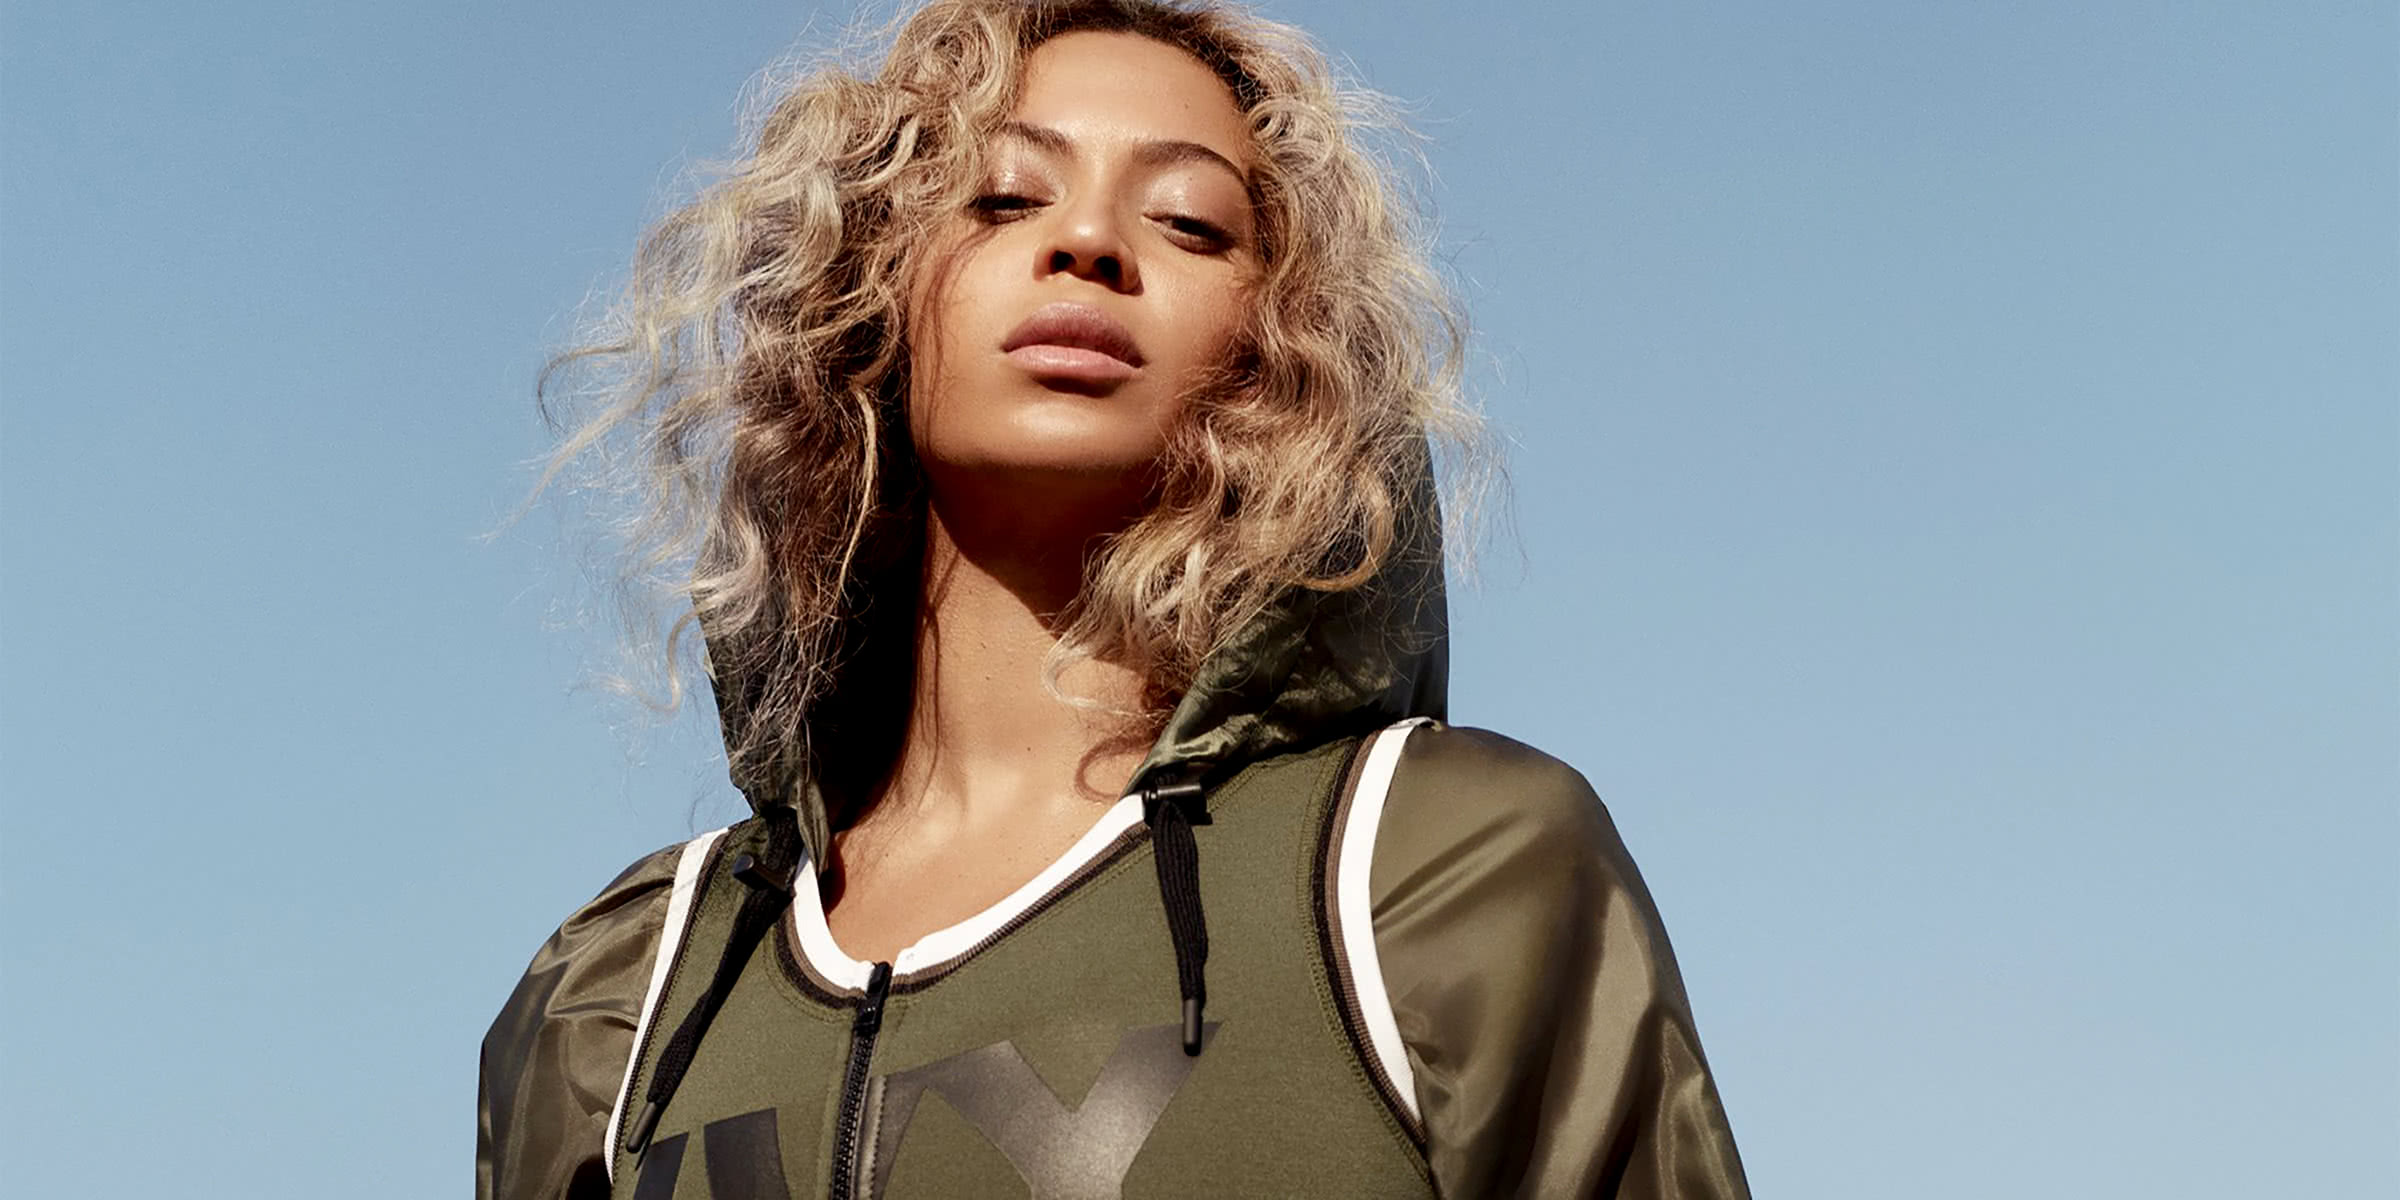 luxury wellness fashion athleisure beyonce luxe digital